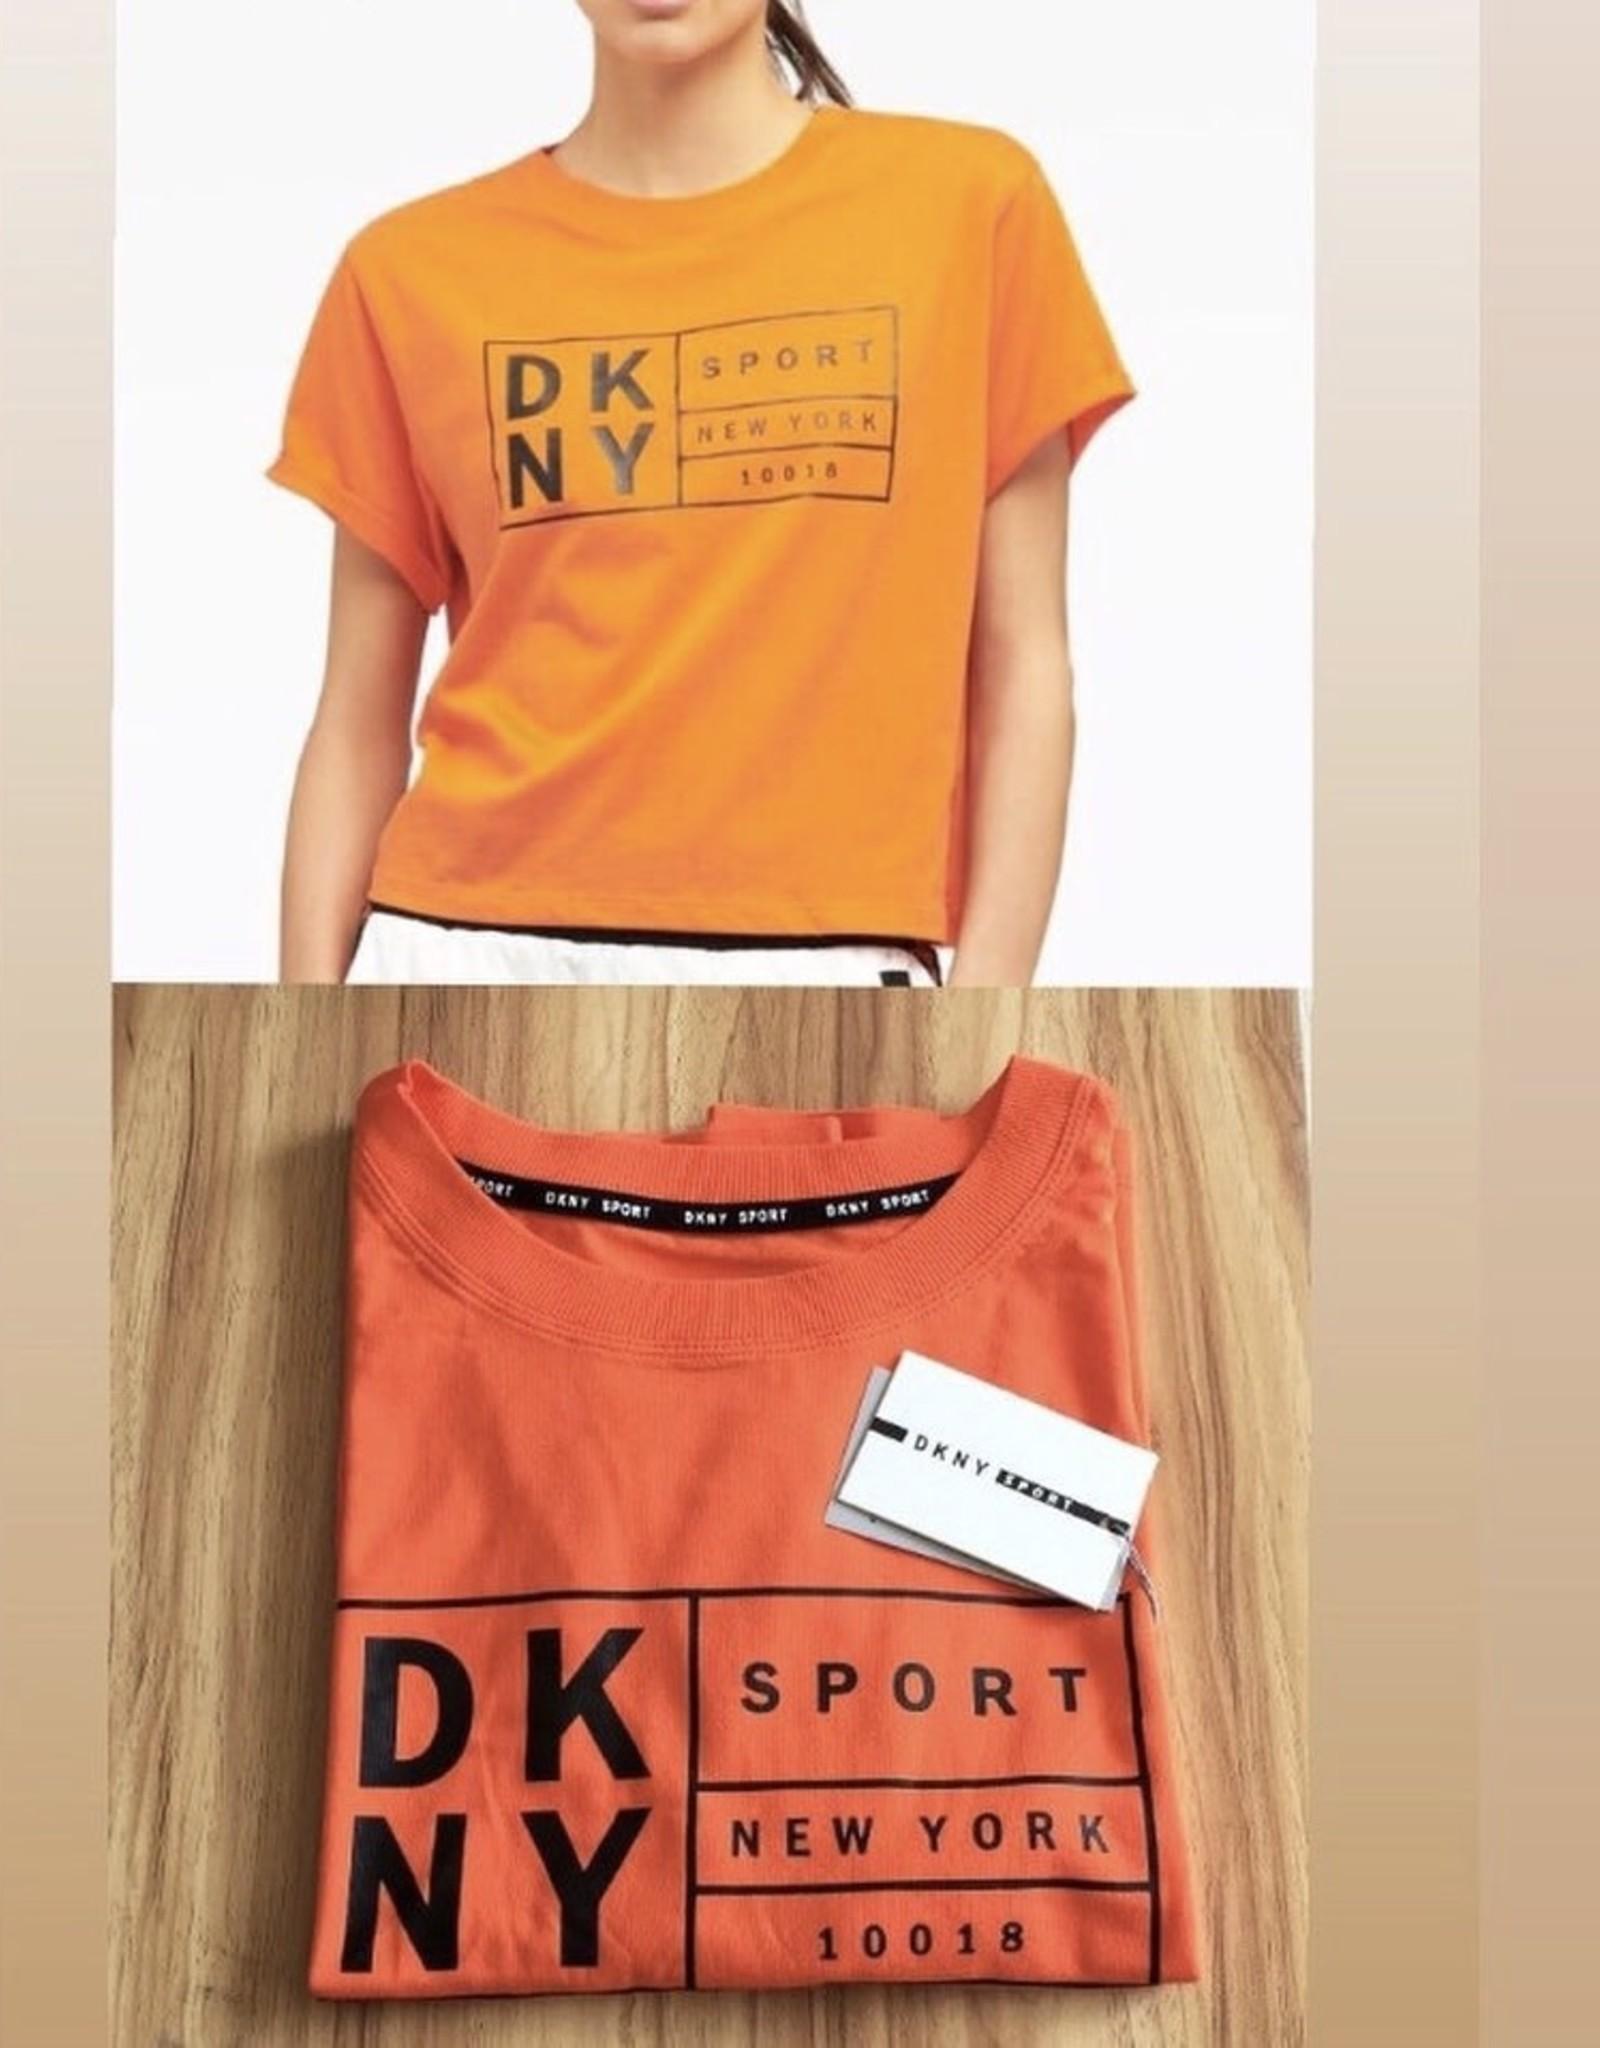 DKNY DKNY Tee Boxy w/ Oversized Label